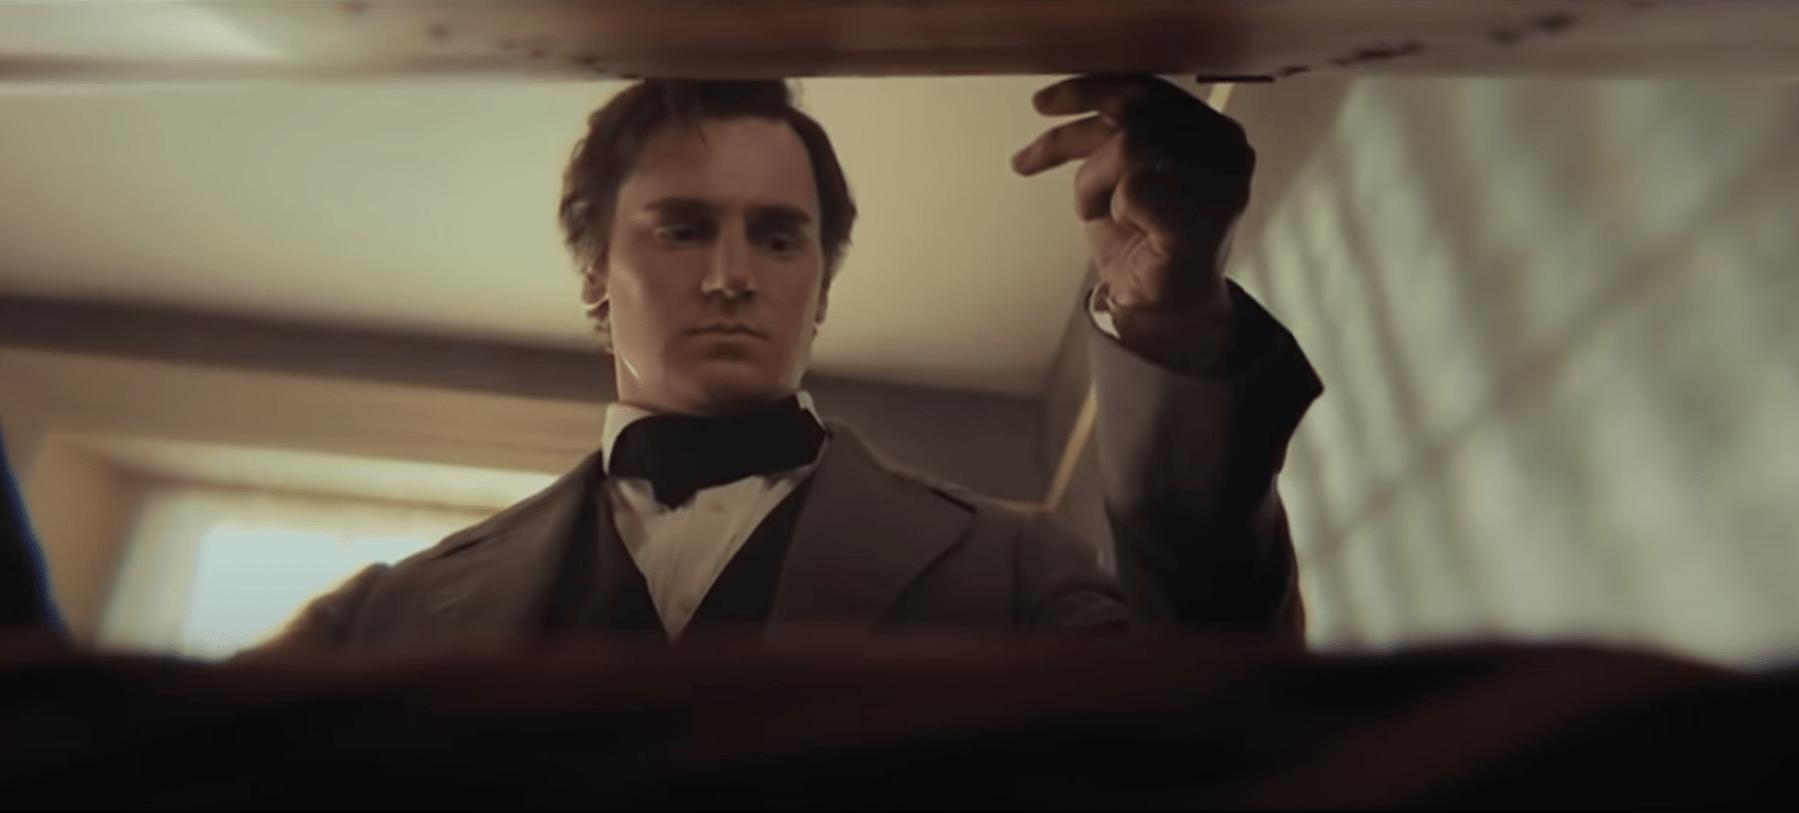 Escena de la película Abraham Lincoln cazador de vampiros